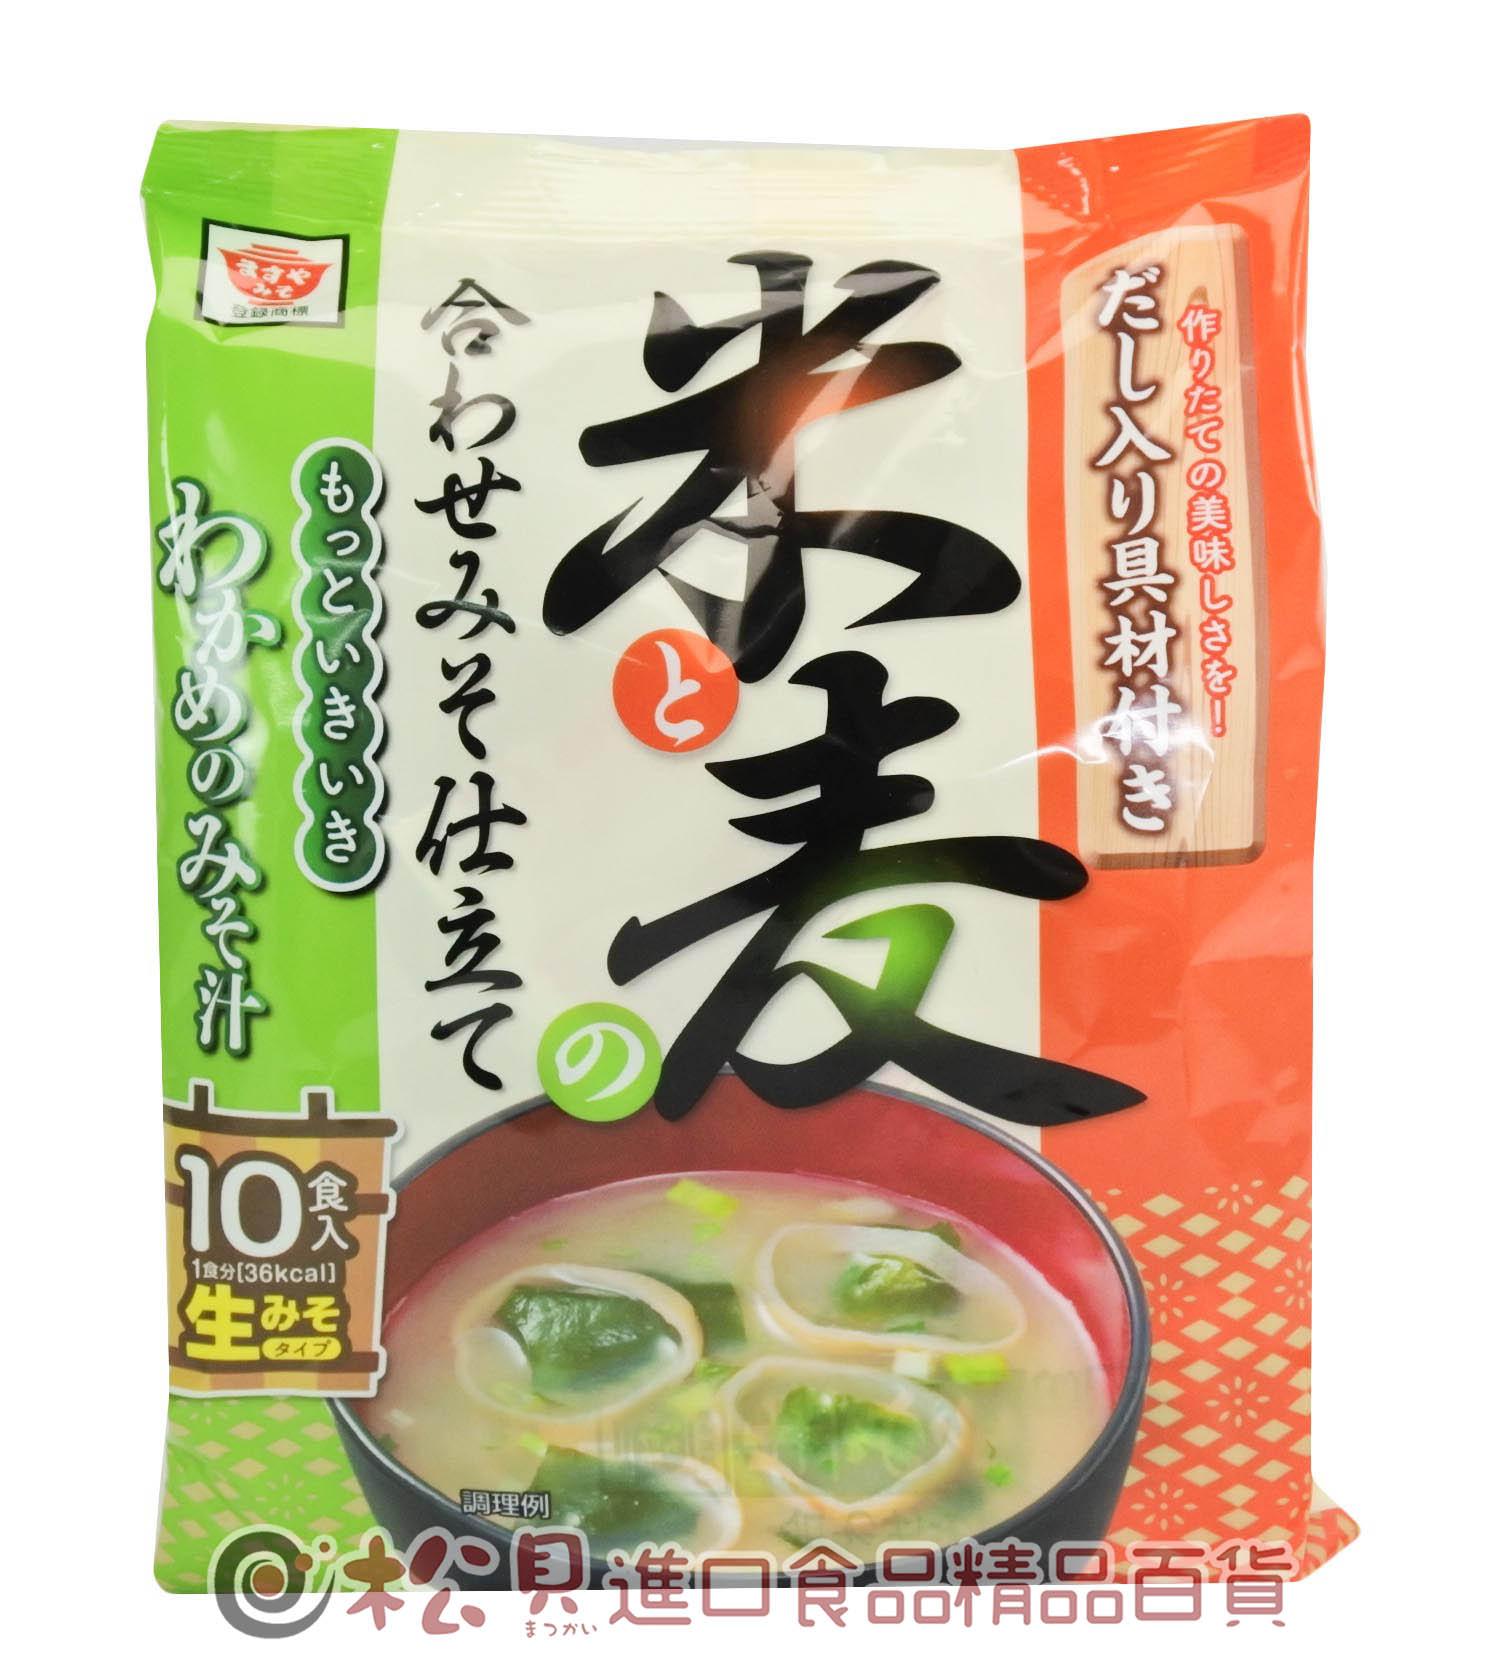 Masuya即席米麥味噌湯10食入204g【4902826274855】.jpg